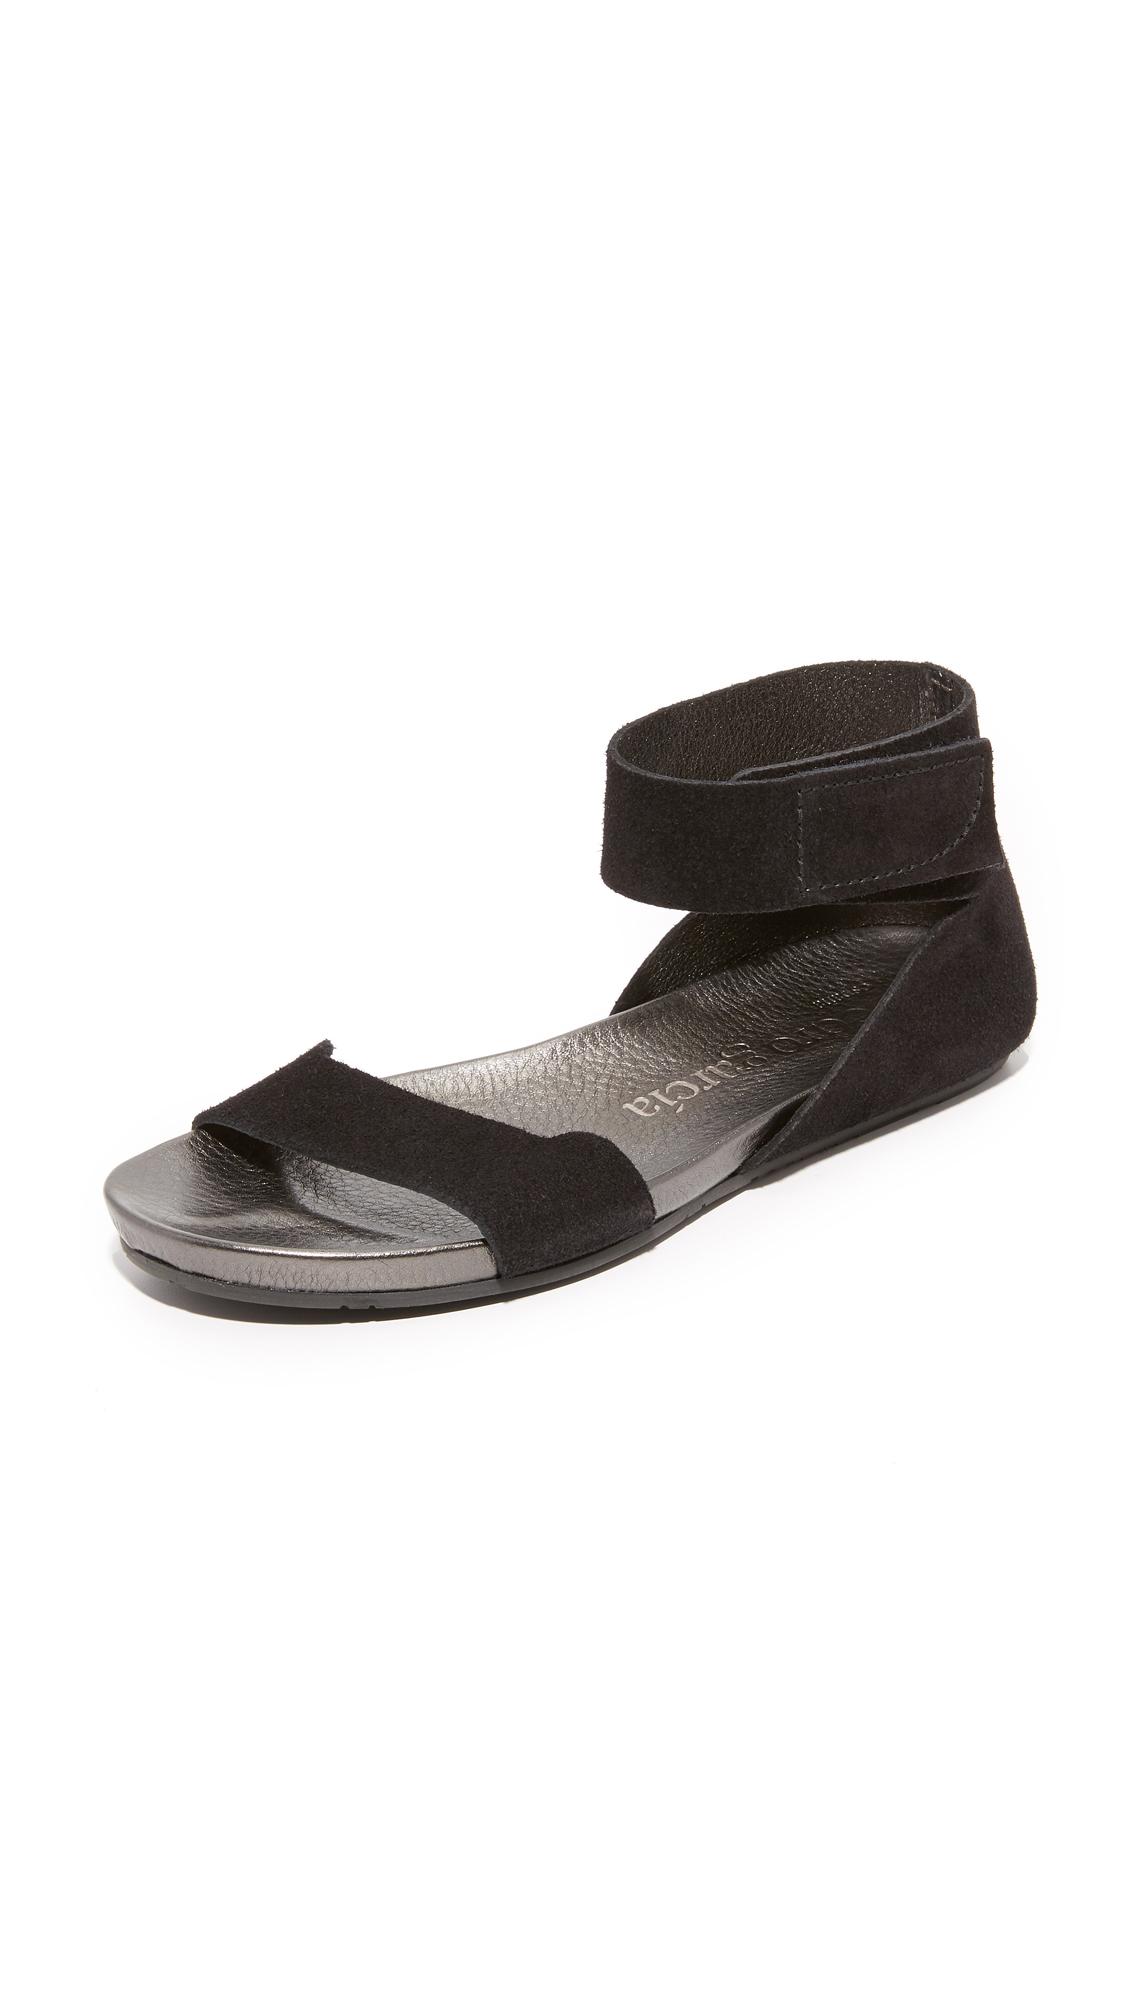 Pedro Garcia Joline Flat Sandals - Black